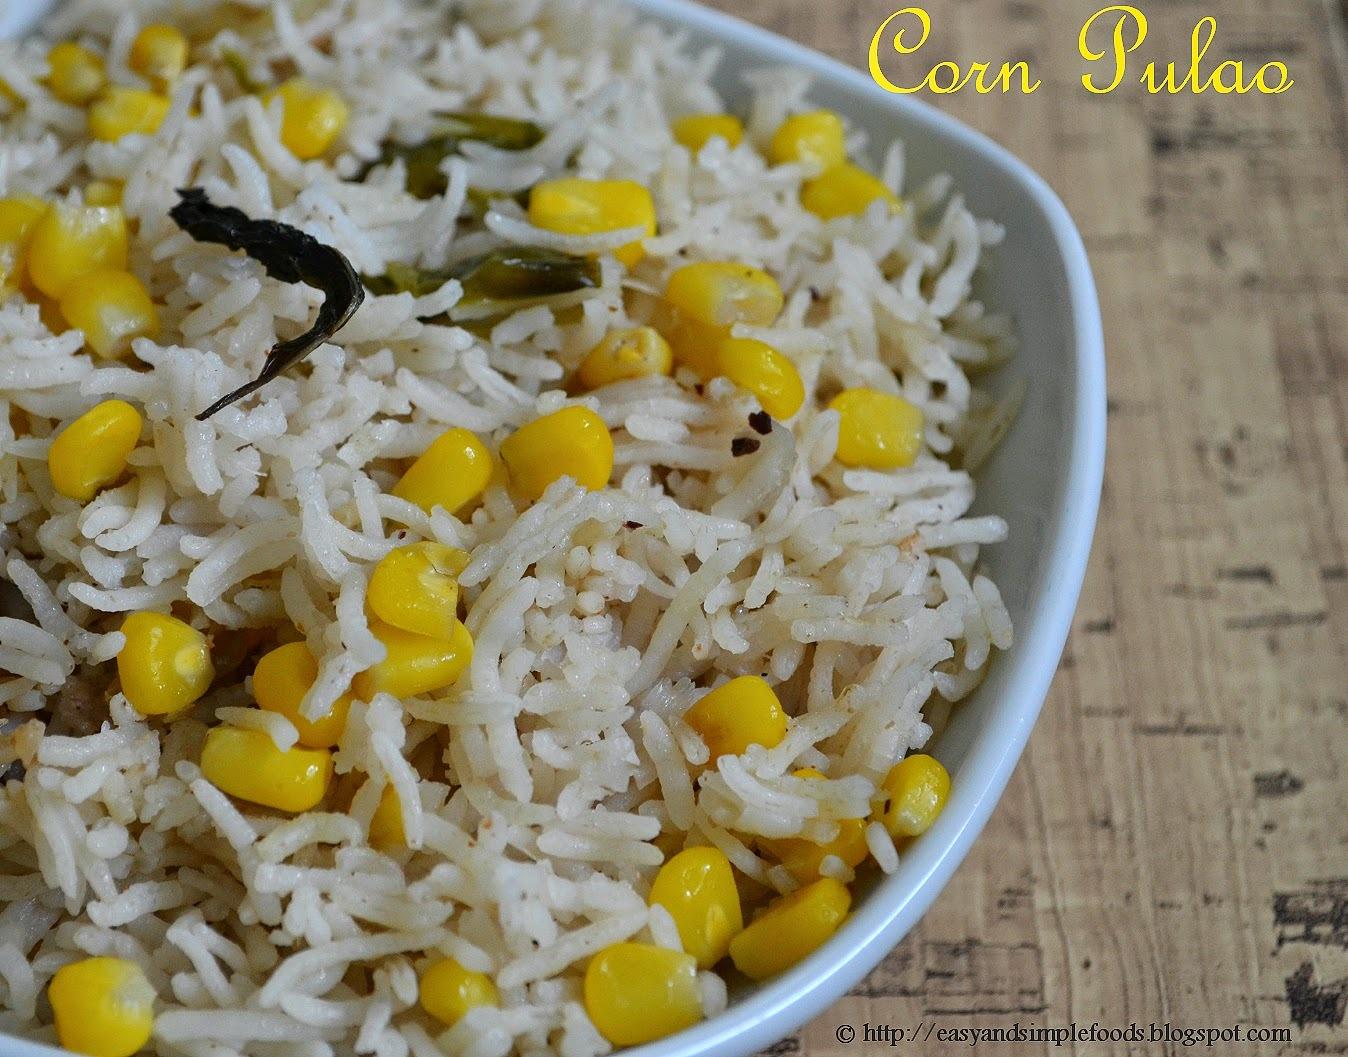 Corn Pulao / Sweet Corn Pulao